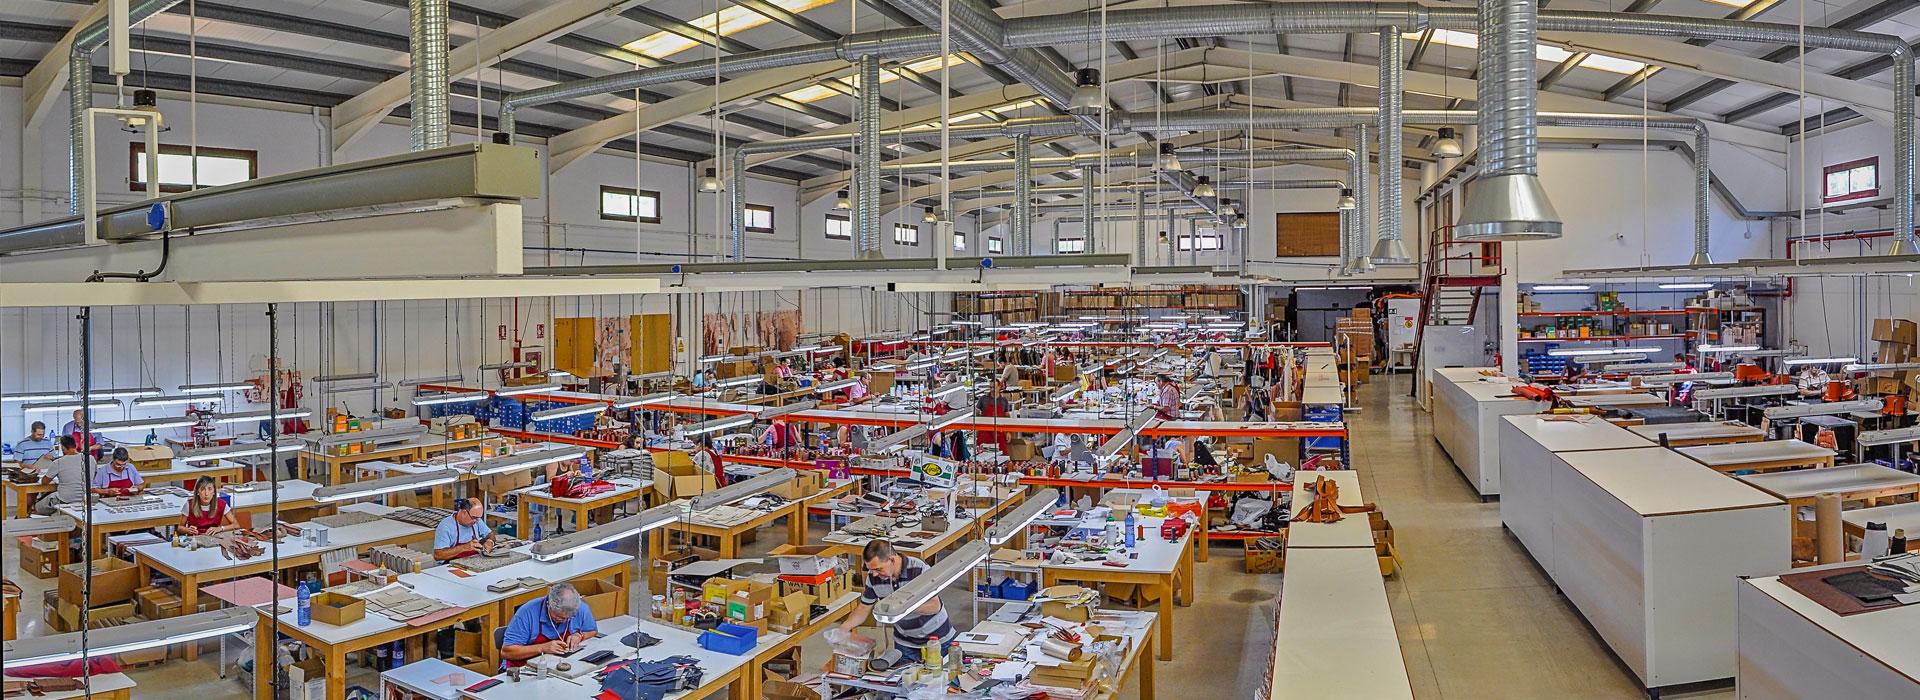 Fabrica Cache artesanos Ubrique